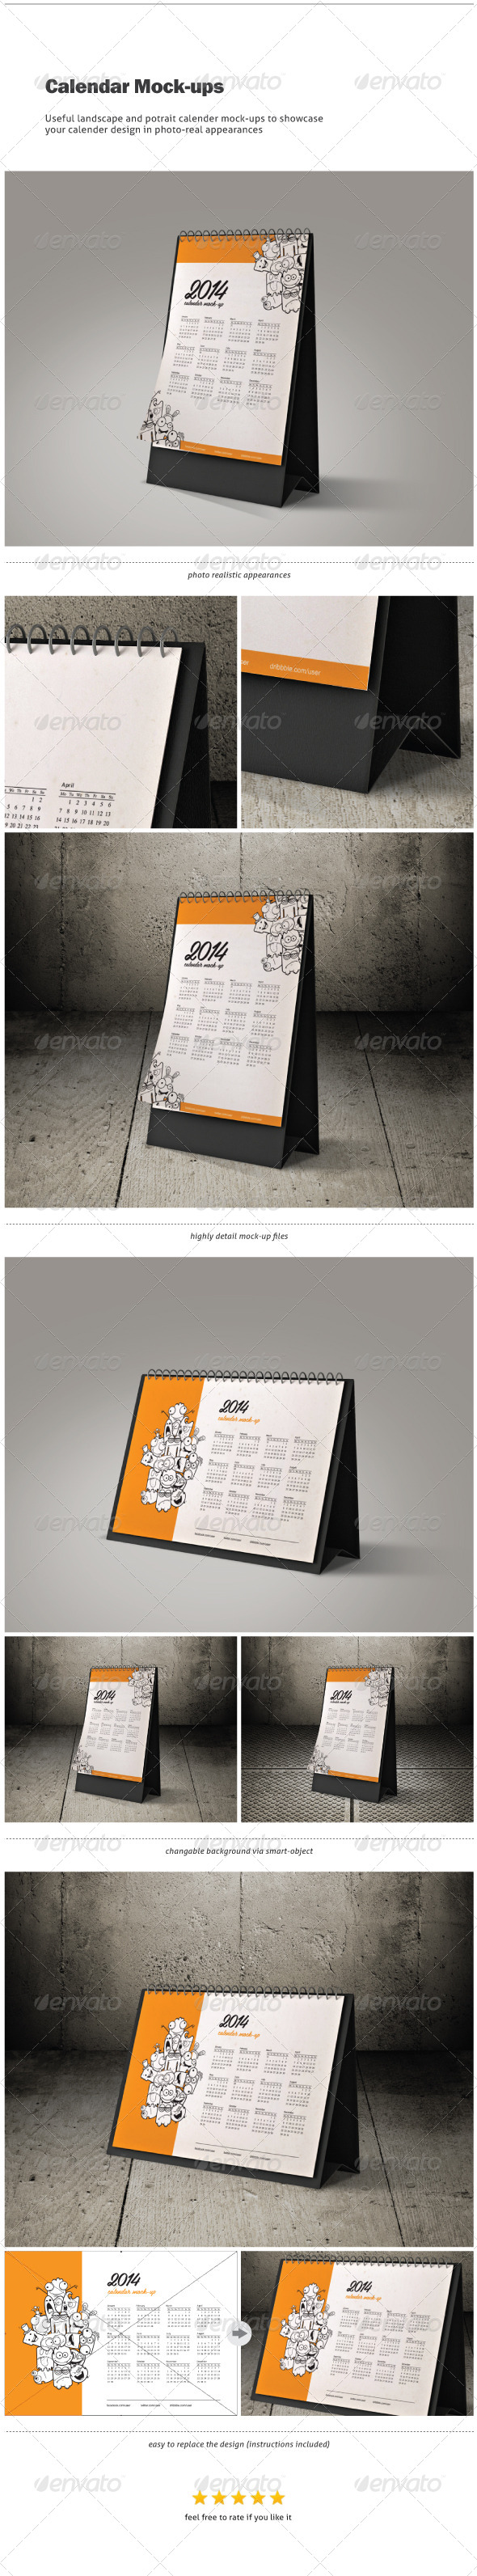 GraphicRiver Calendar Mock-ups Landscape and Portrait 6405904